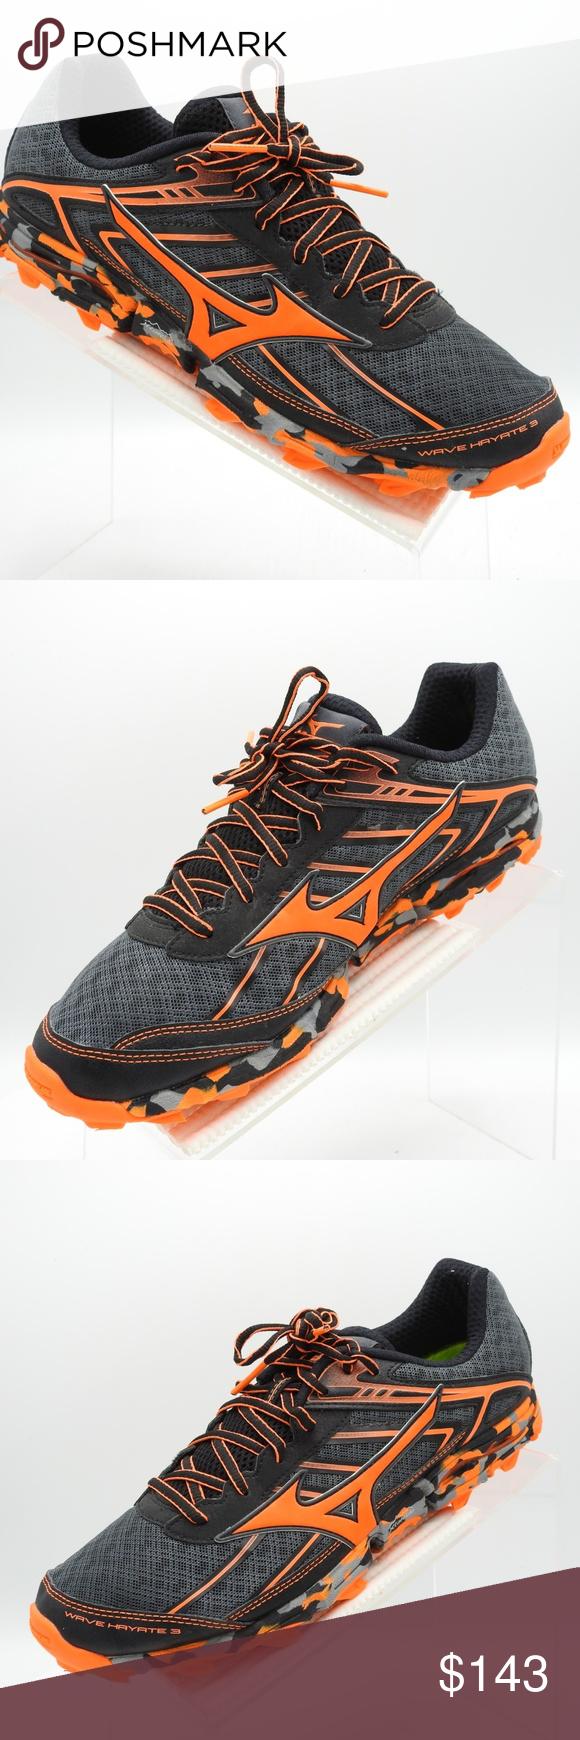 pretty nice 2b61b e08fe Mizuno Wave Hayate 3 Size 10.5 Athletic Mens Shoes Mizuno ...